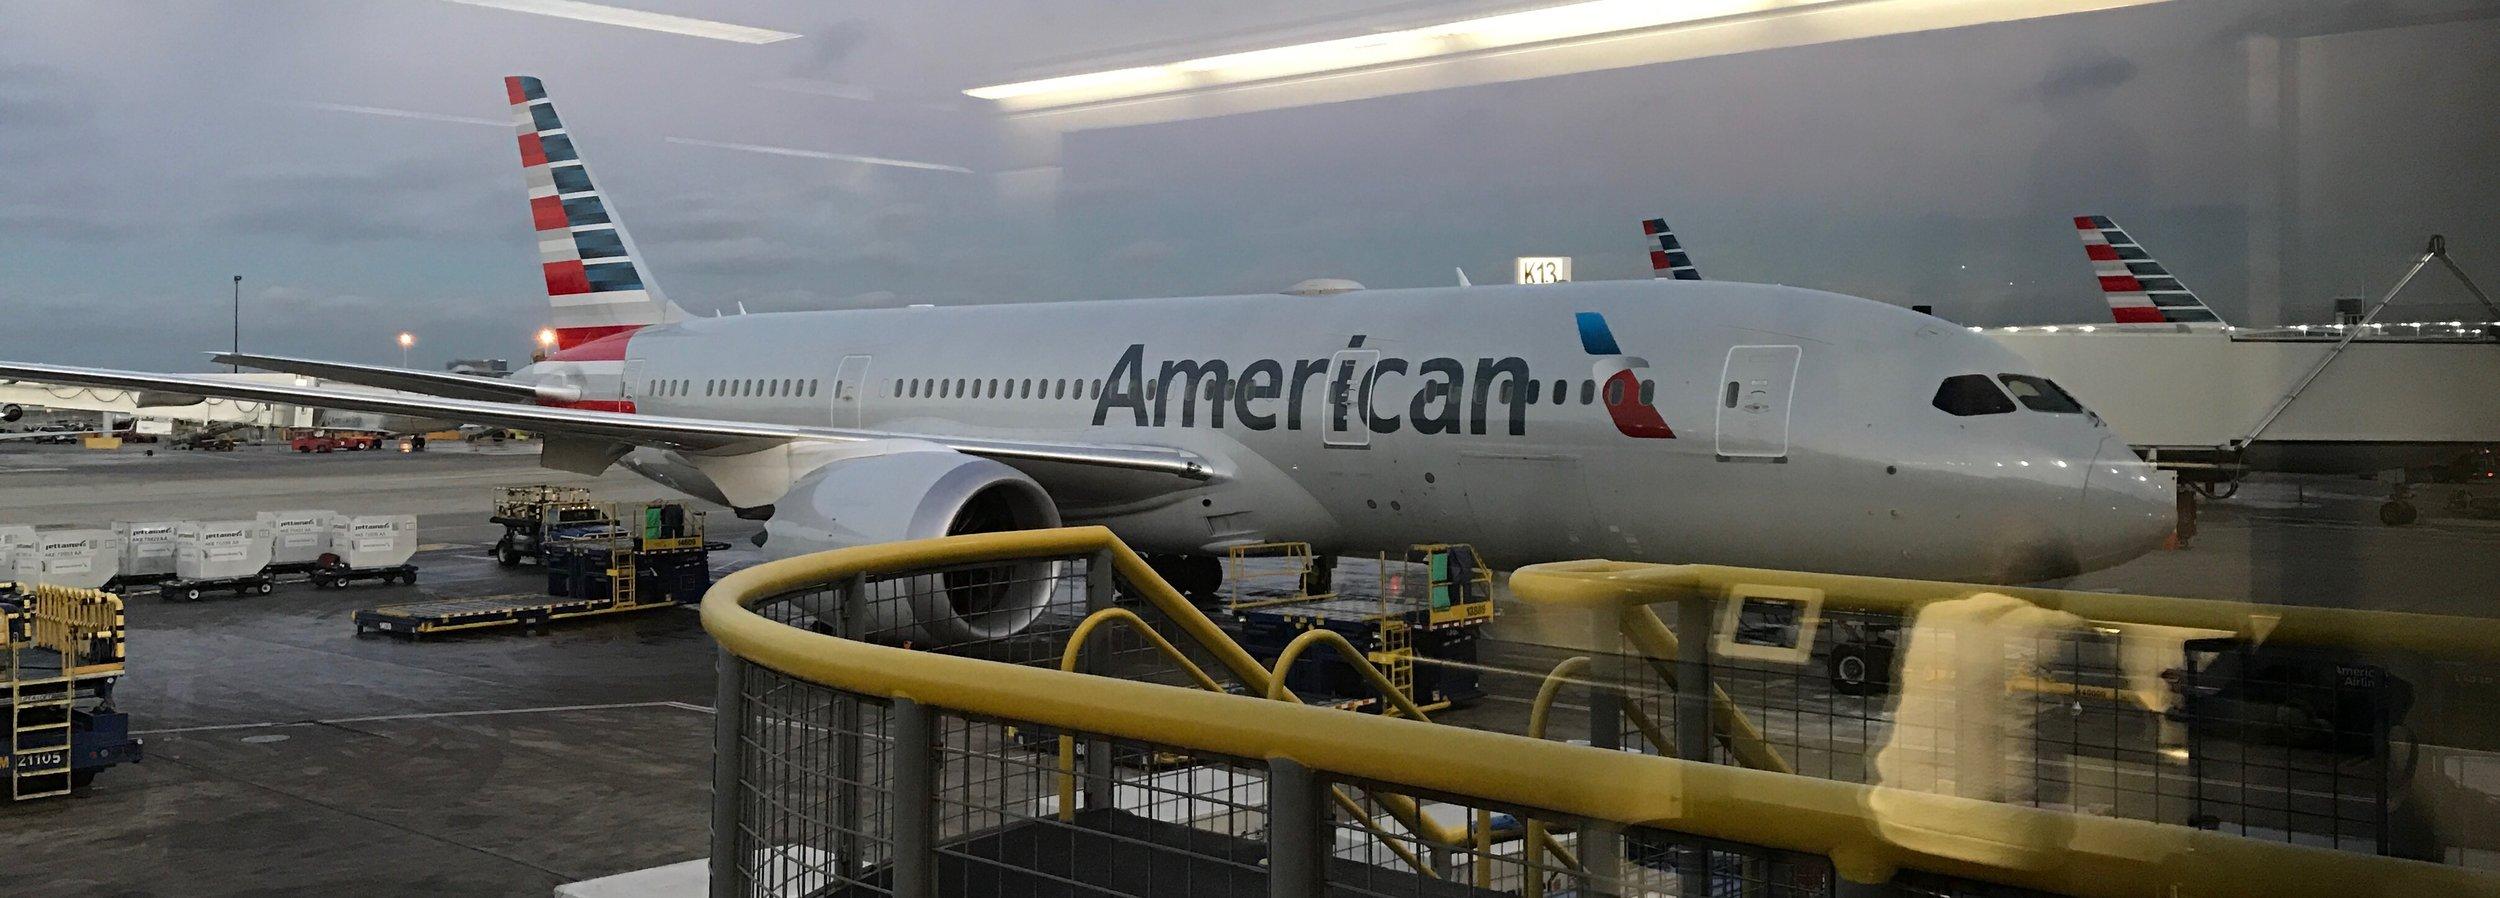 American Airlines 787-8 Dreamliner